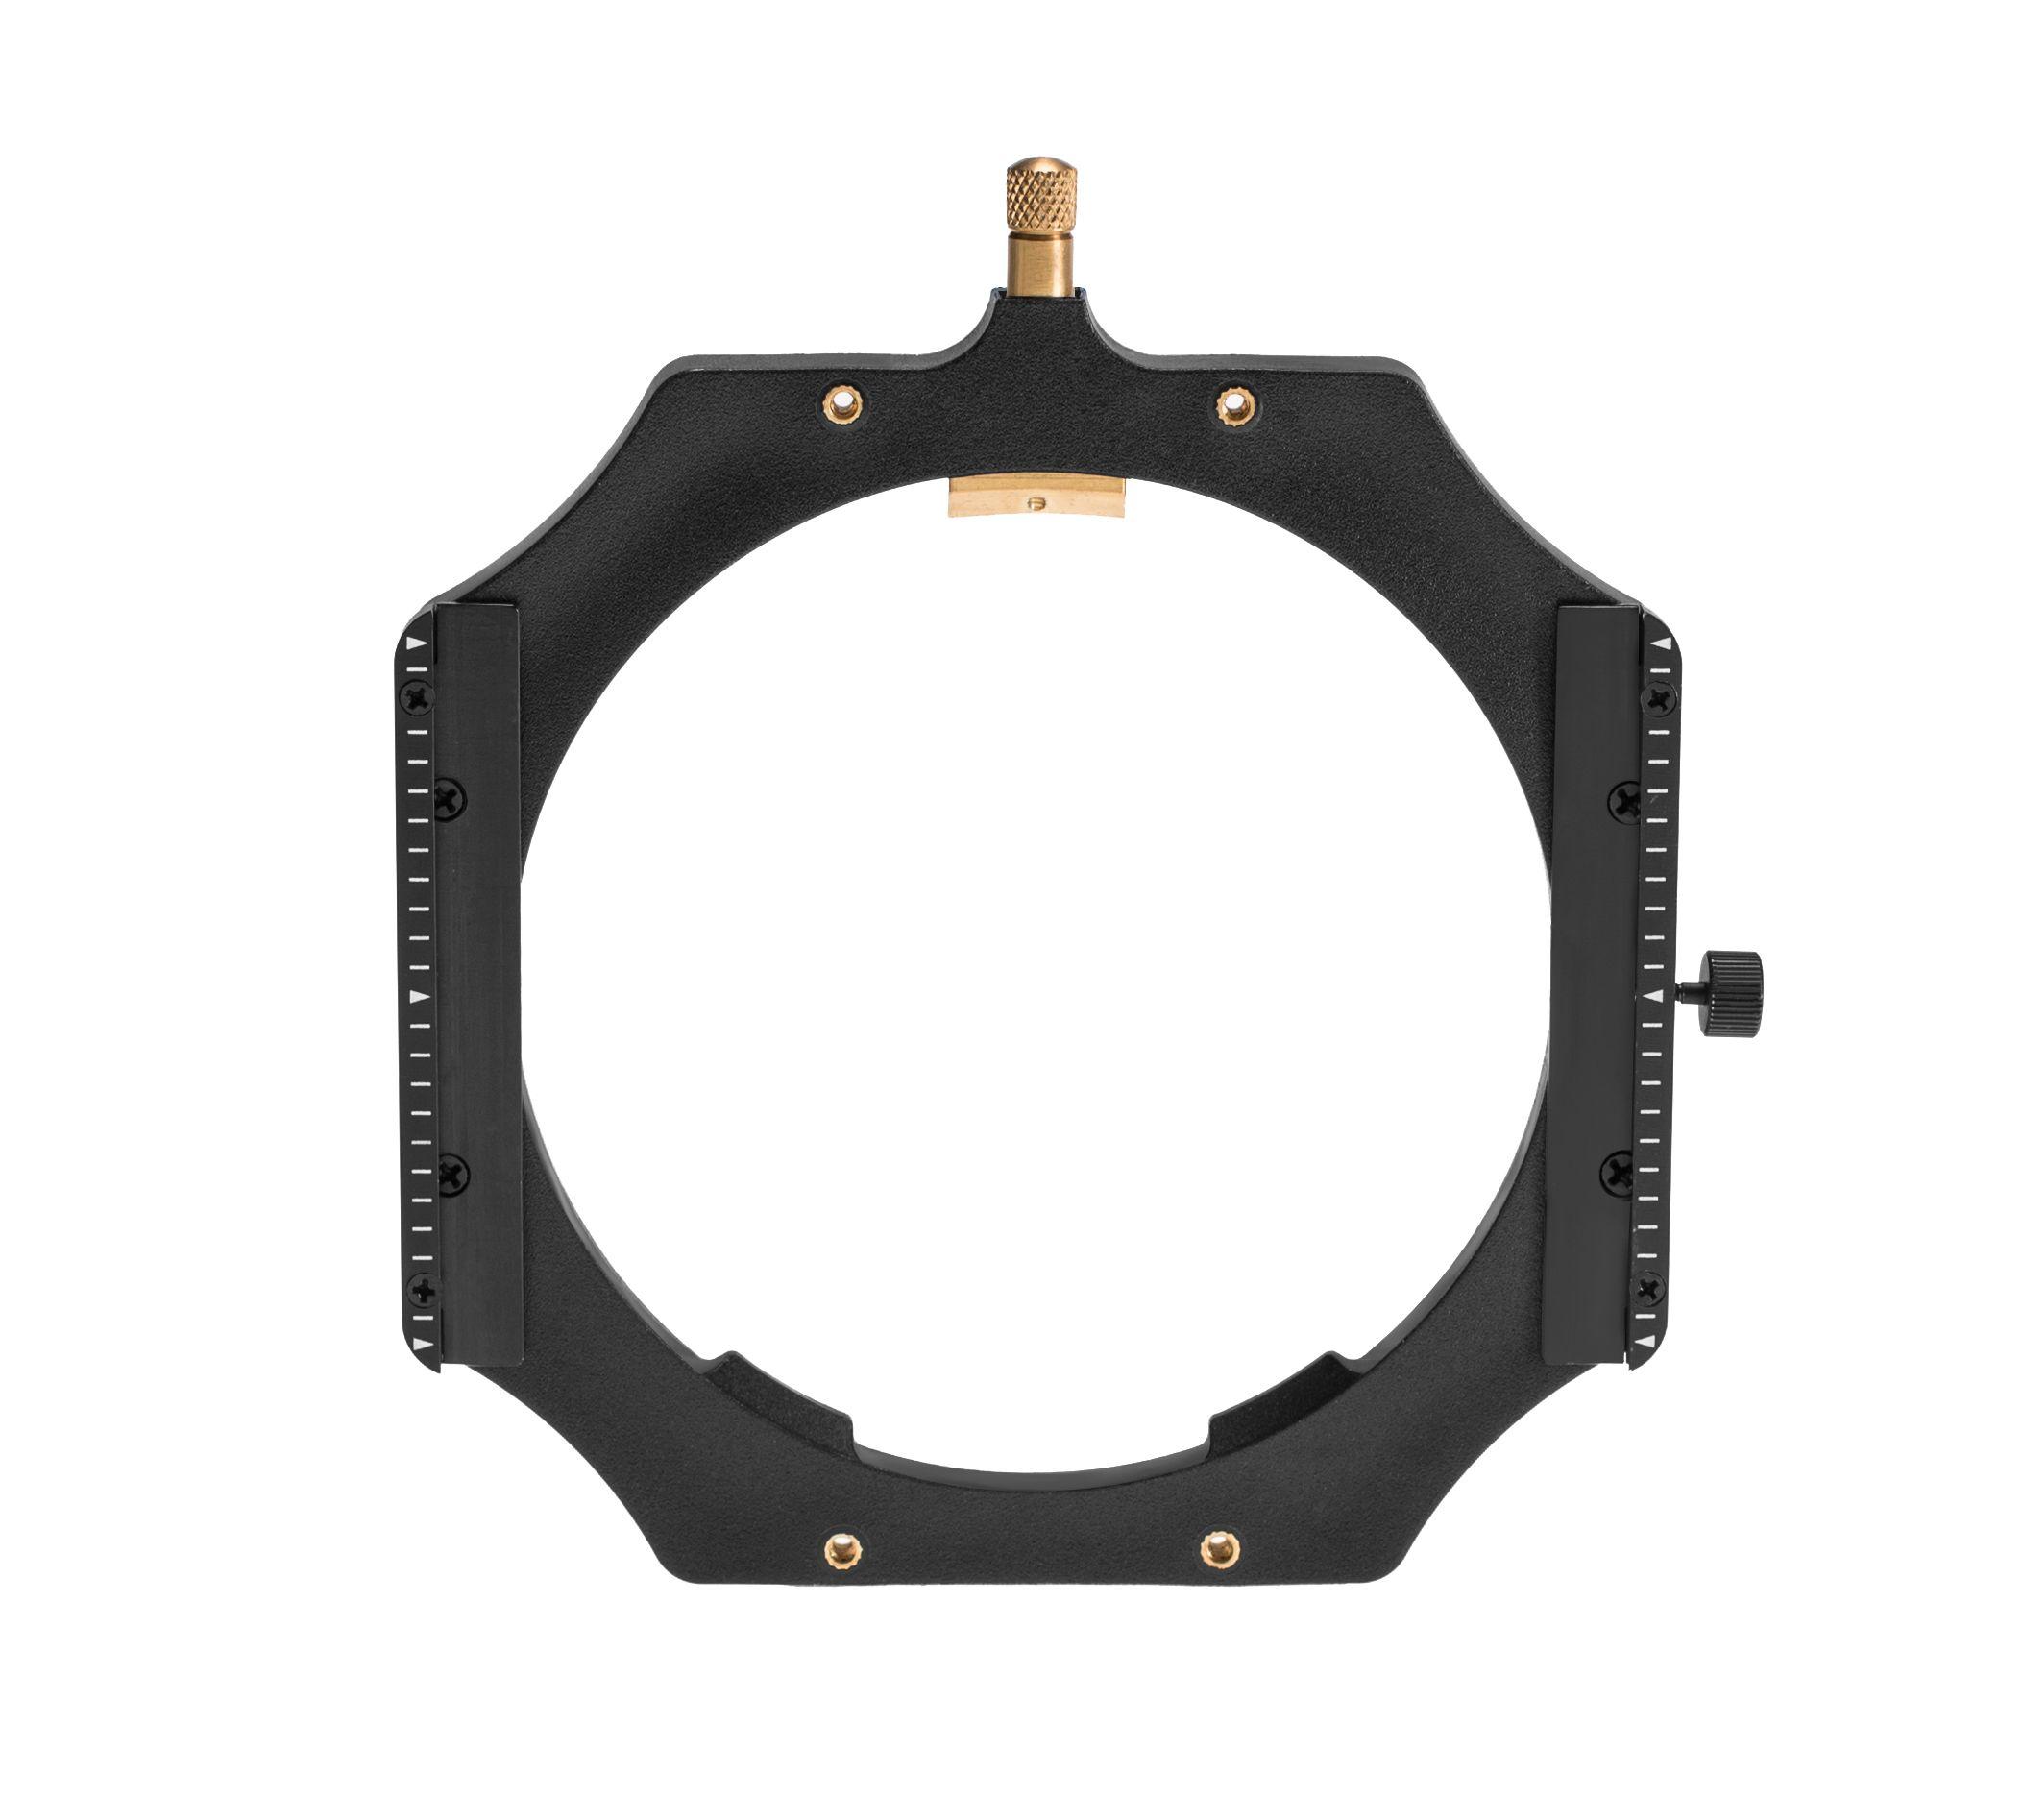 Upgrade LEE FILTERS FOUNDATION KIT HOLDER to Magnetic Usage